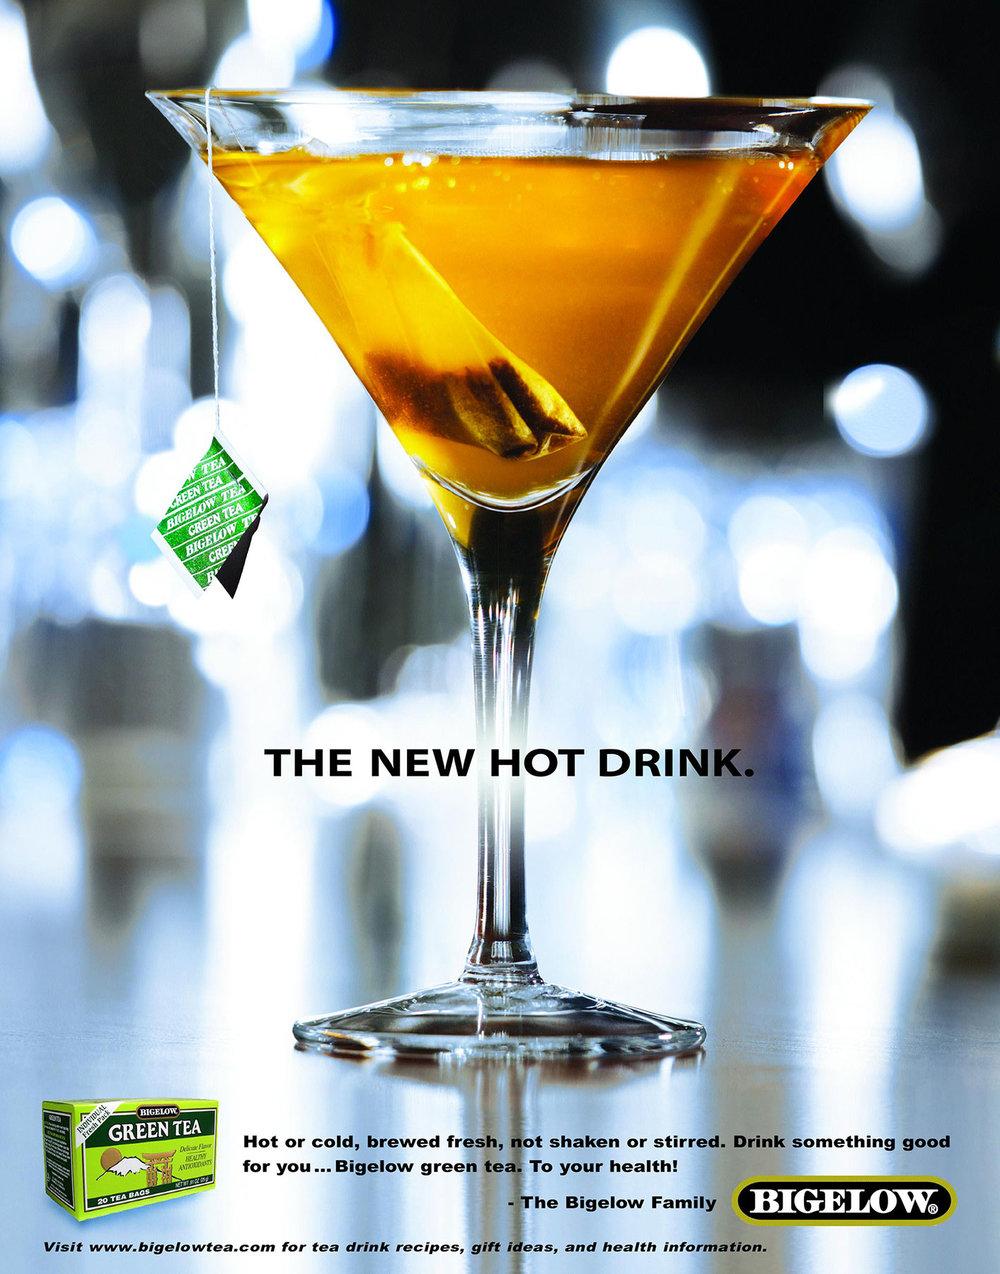 Bigelow-martini_ad.jpg